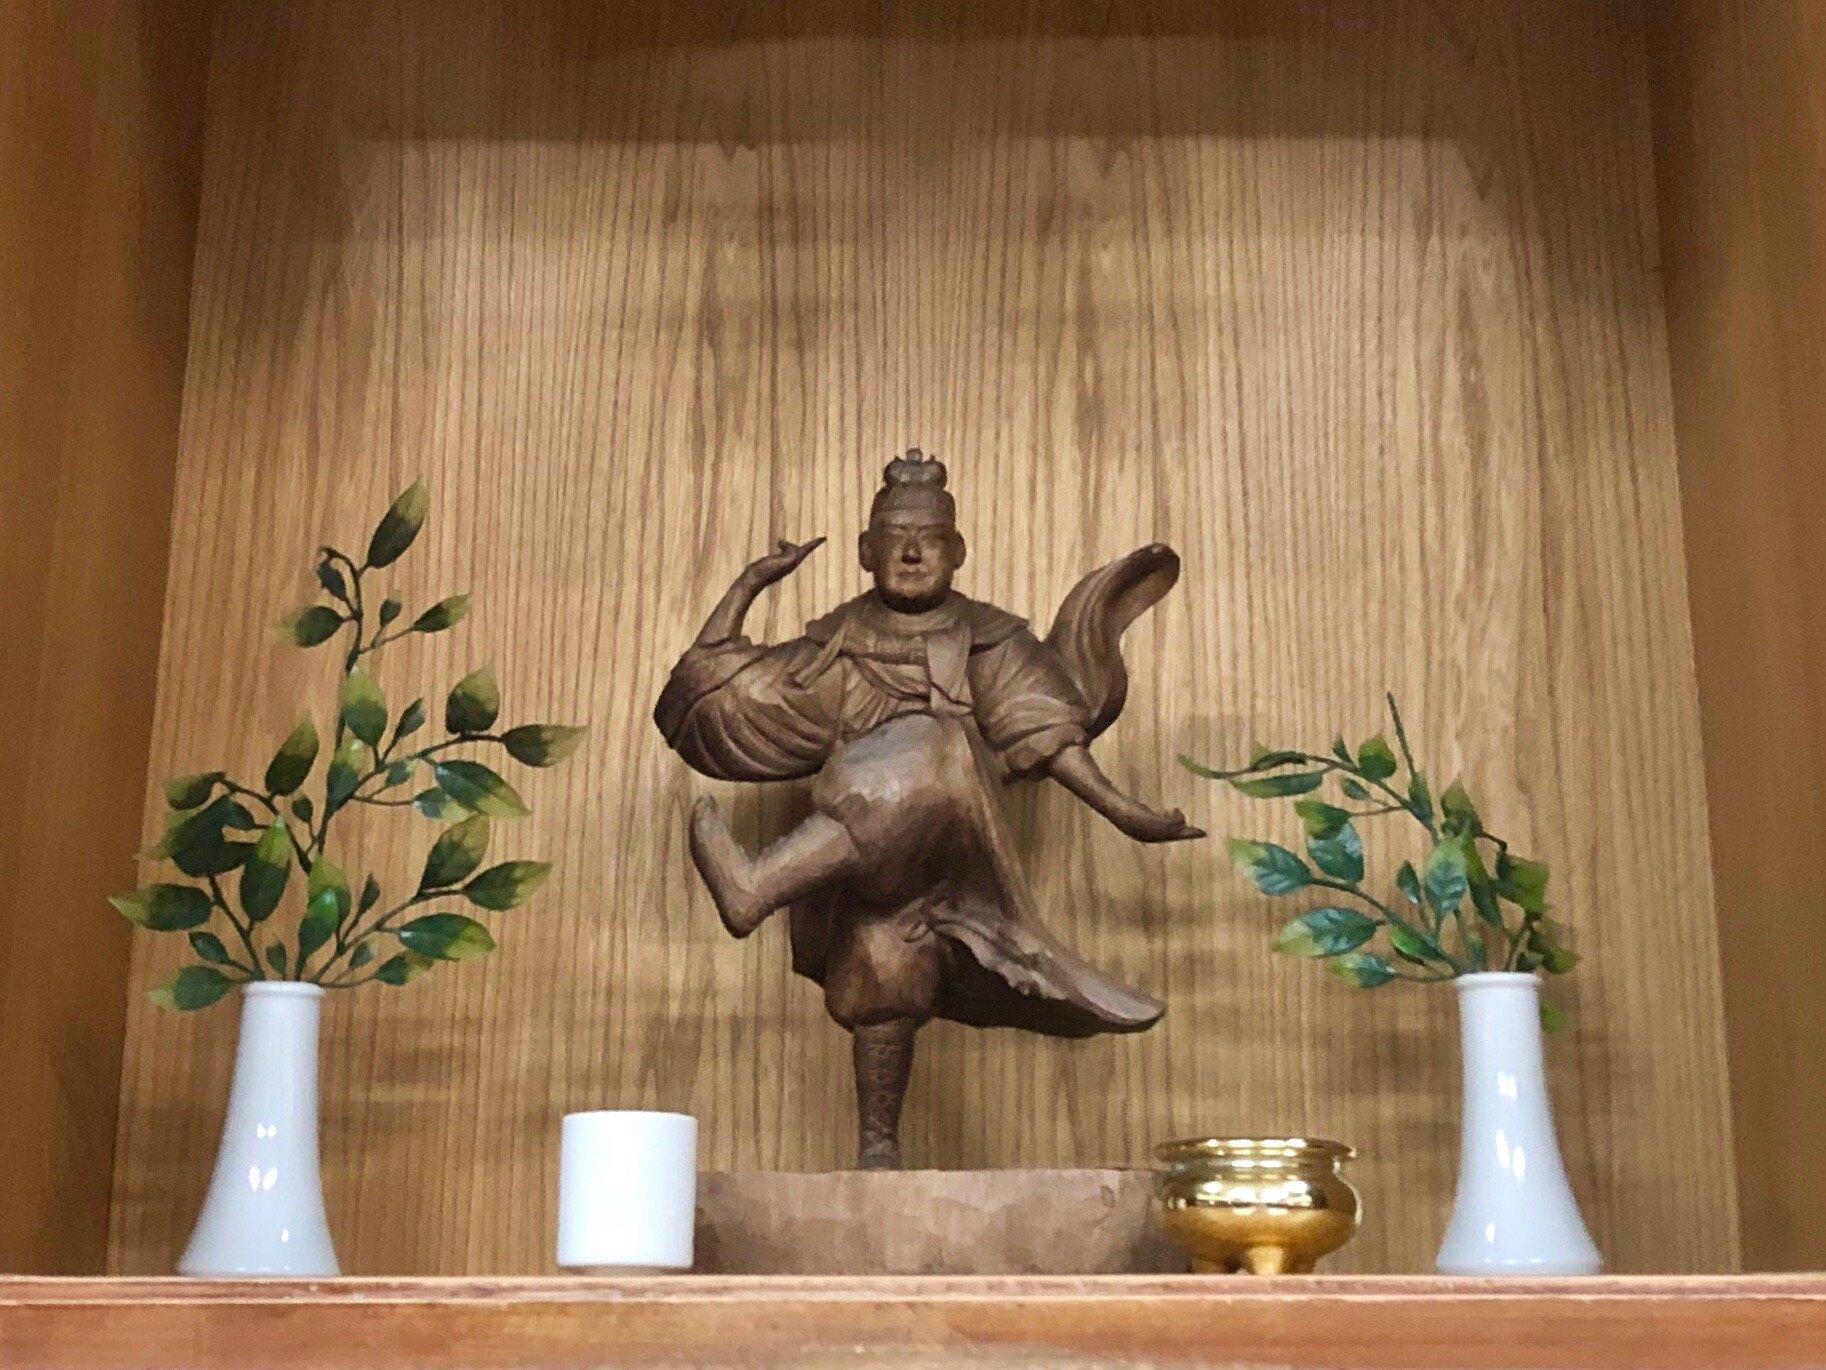 Busaganashi Statue in the Jundokan